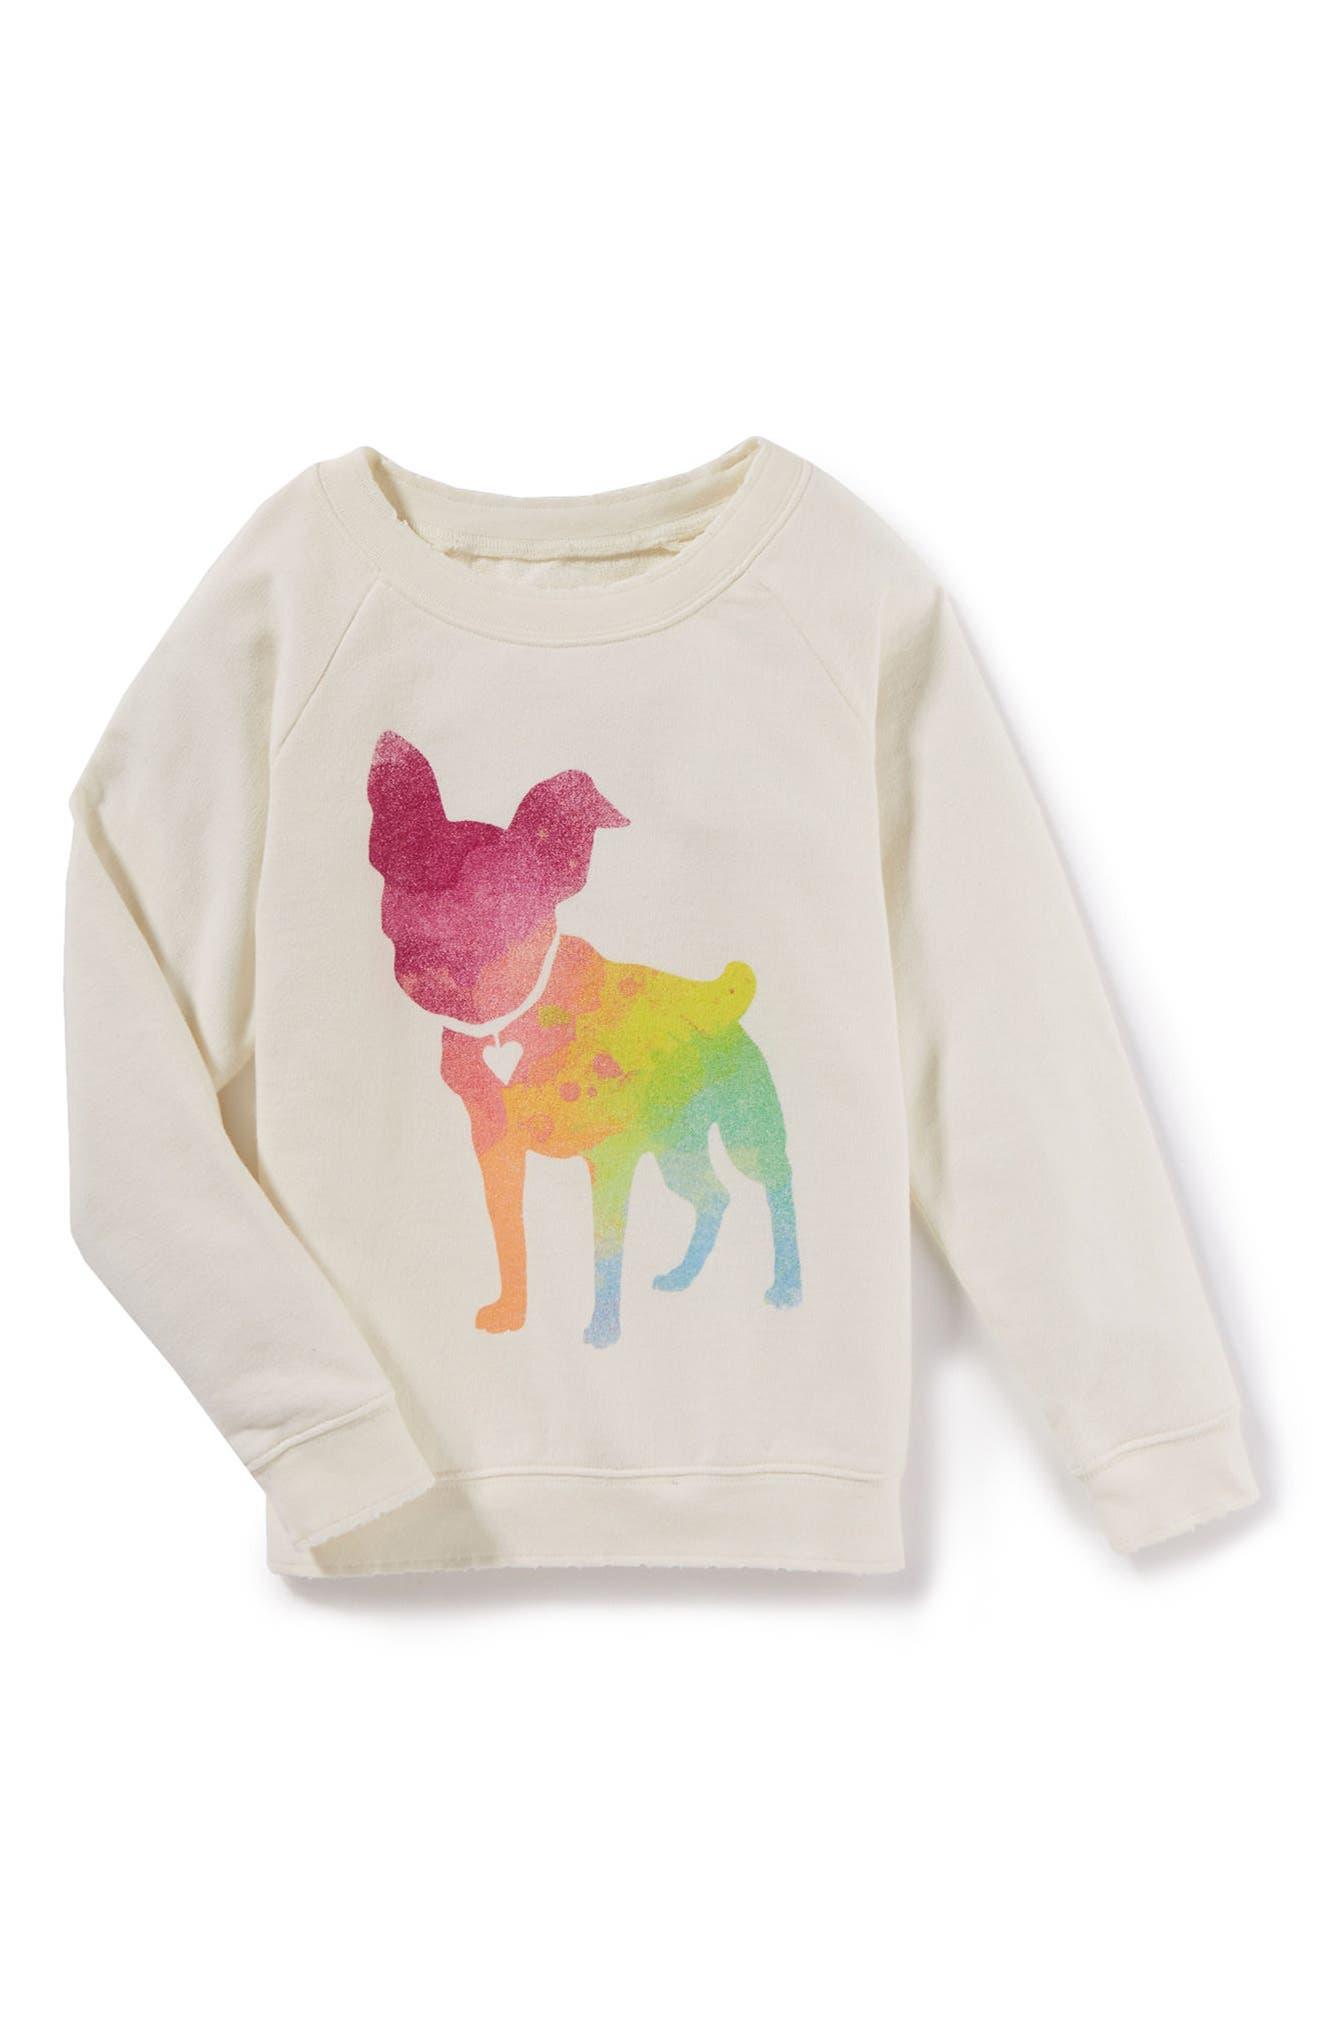 Alternate Image 1 Selected - Peek Colette Graphic Sweatshirt (Toddler Girls, Little Girls & Big Girls)